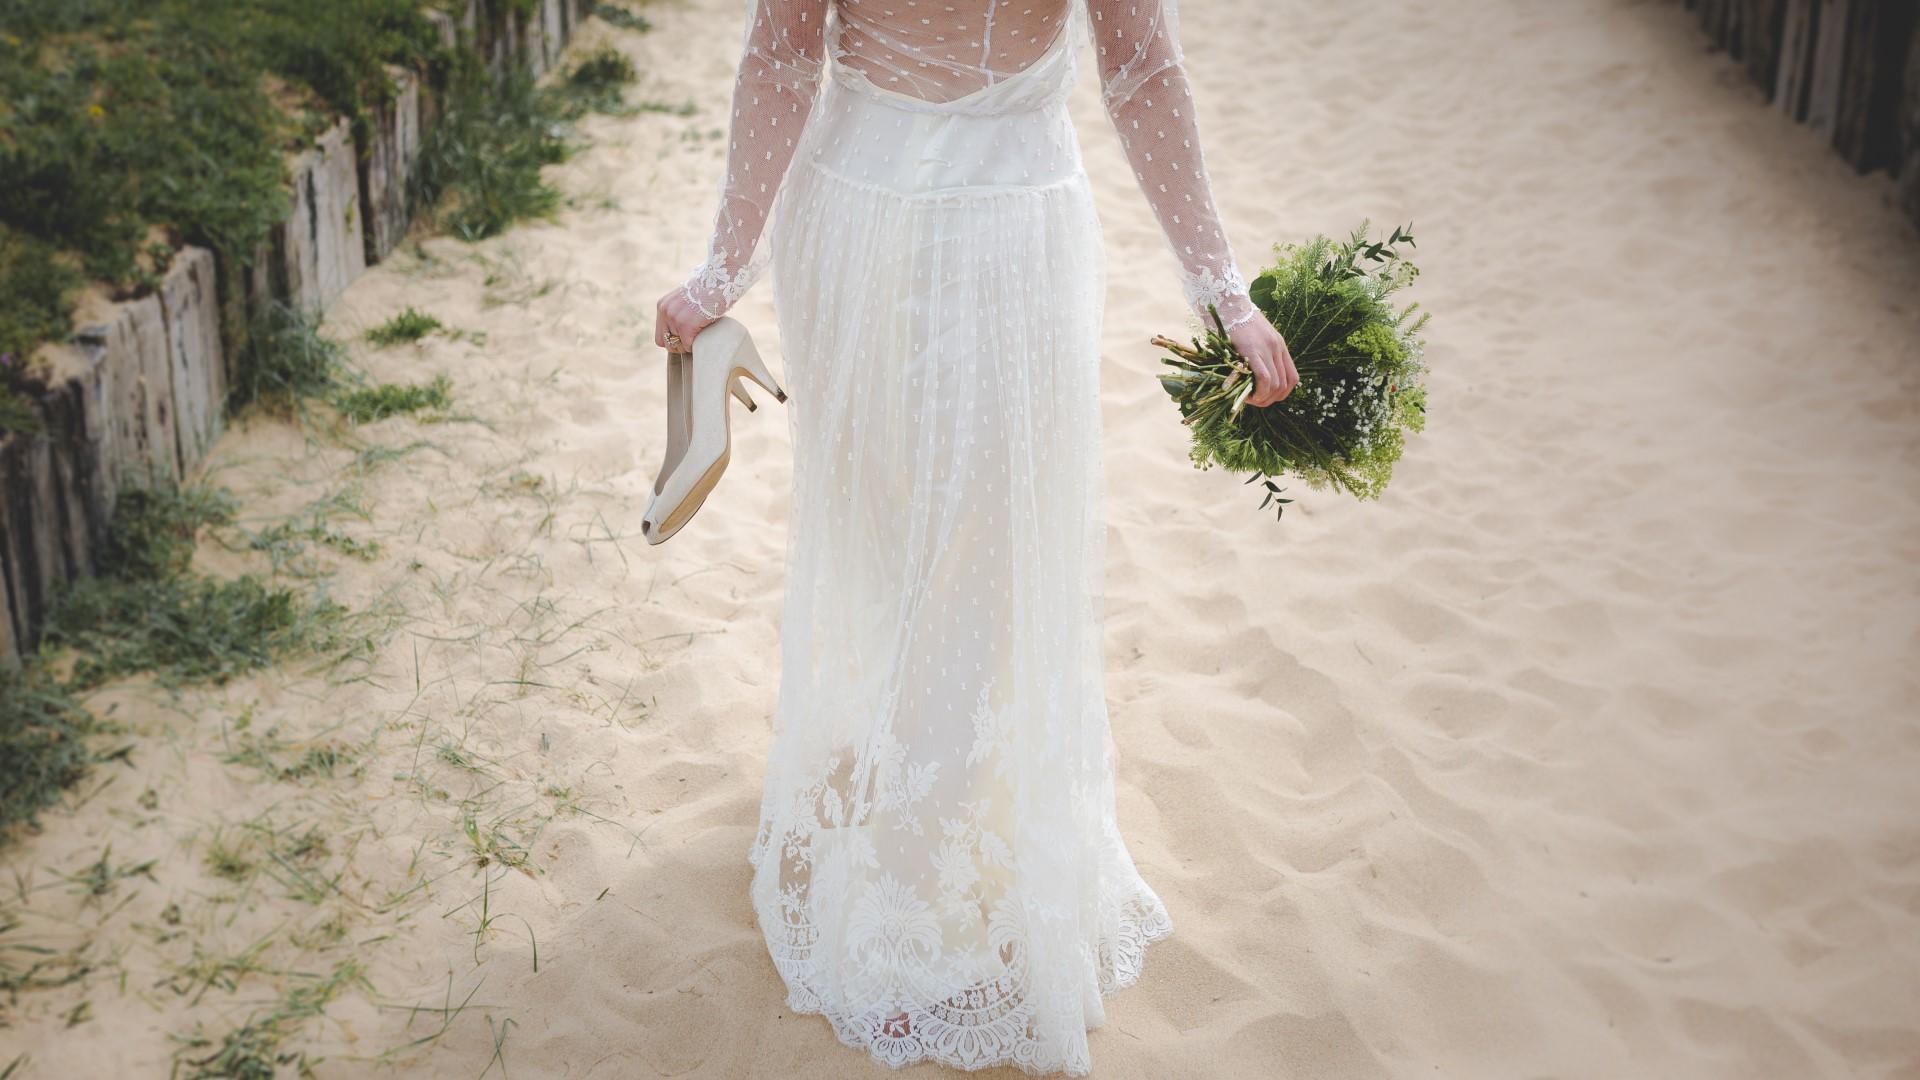 Top 7 Asian Destinations for a Perfect Beach Wedding